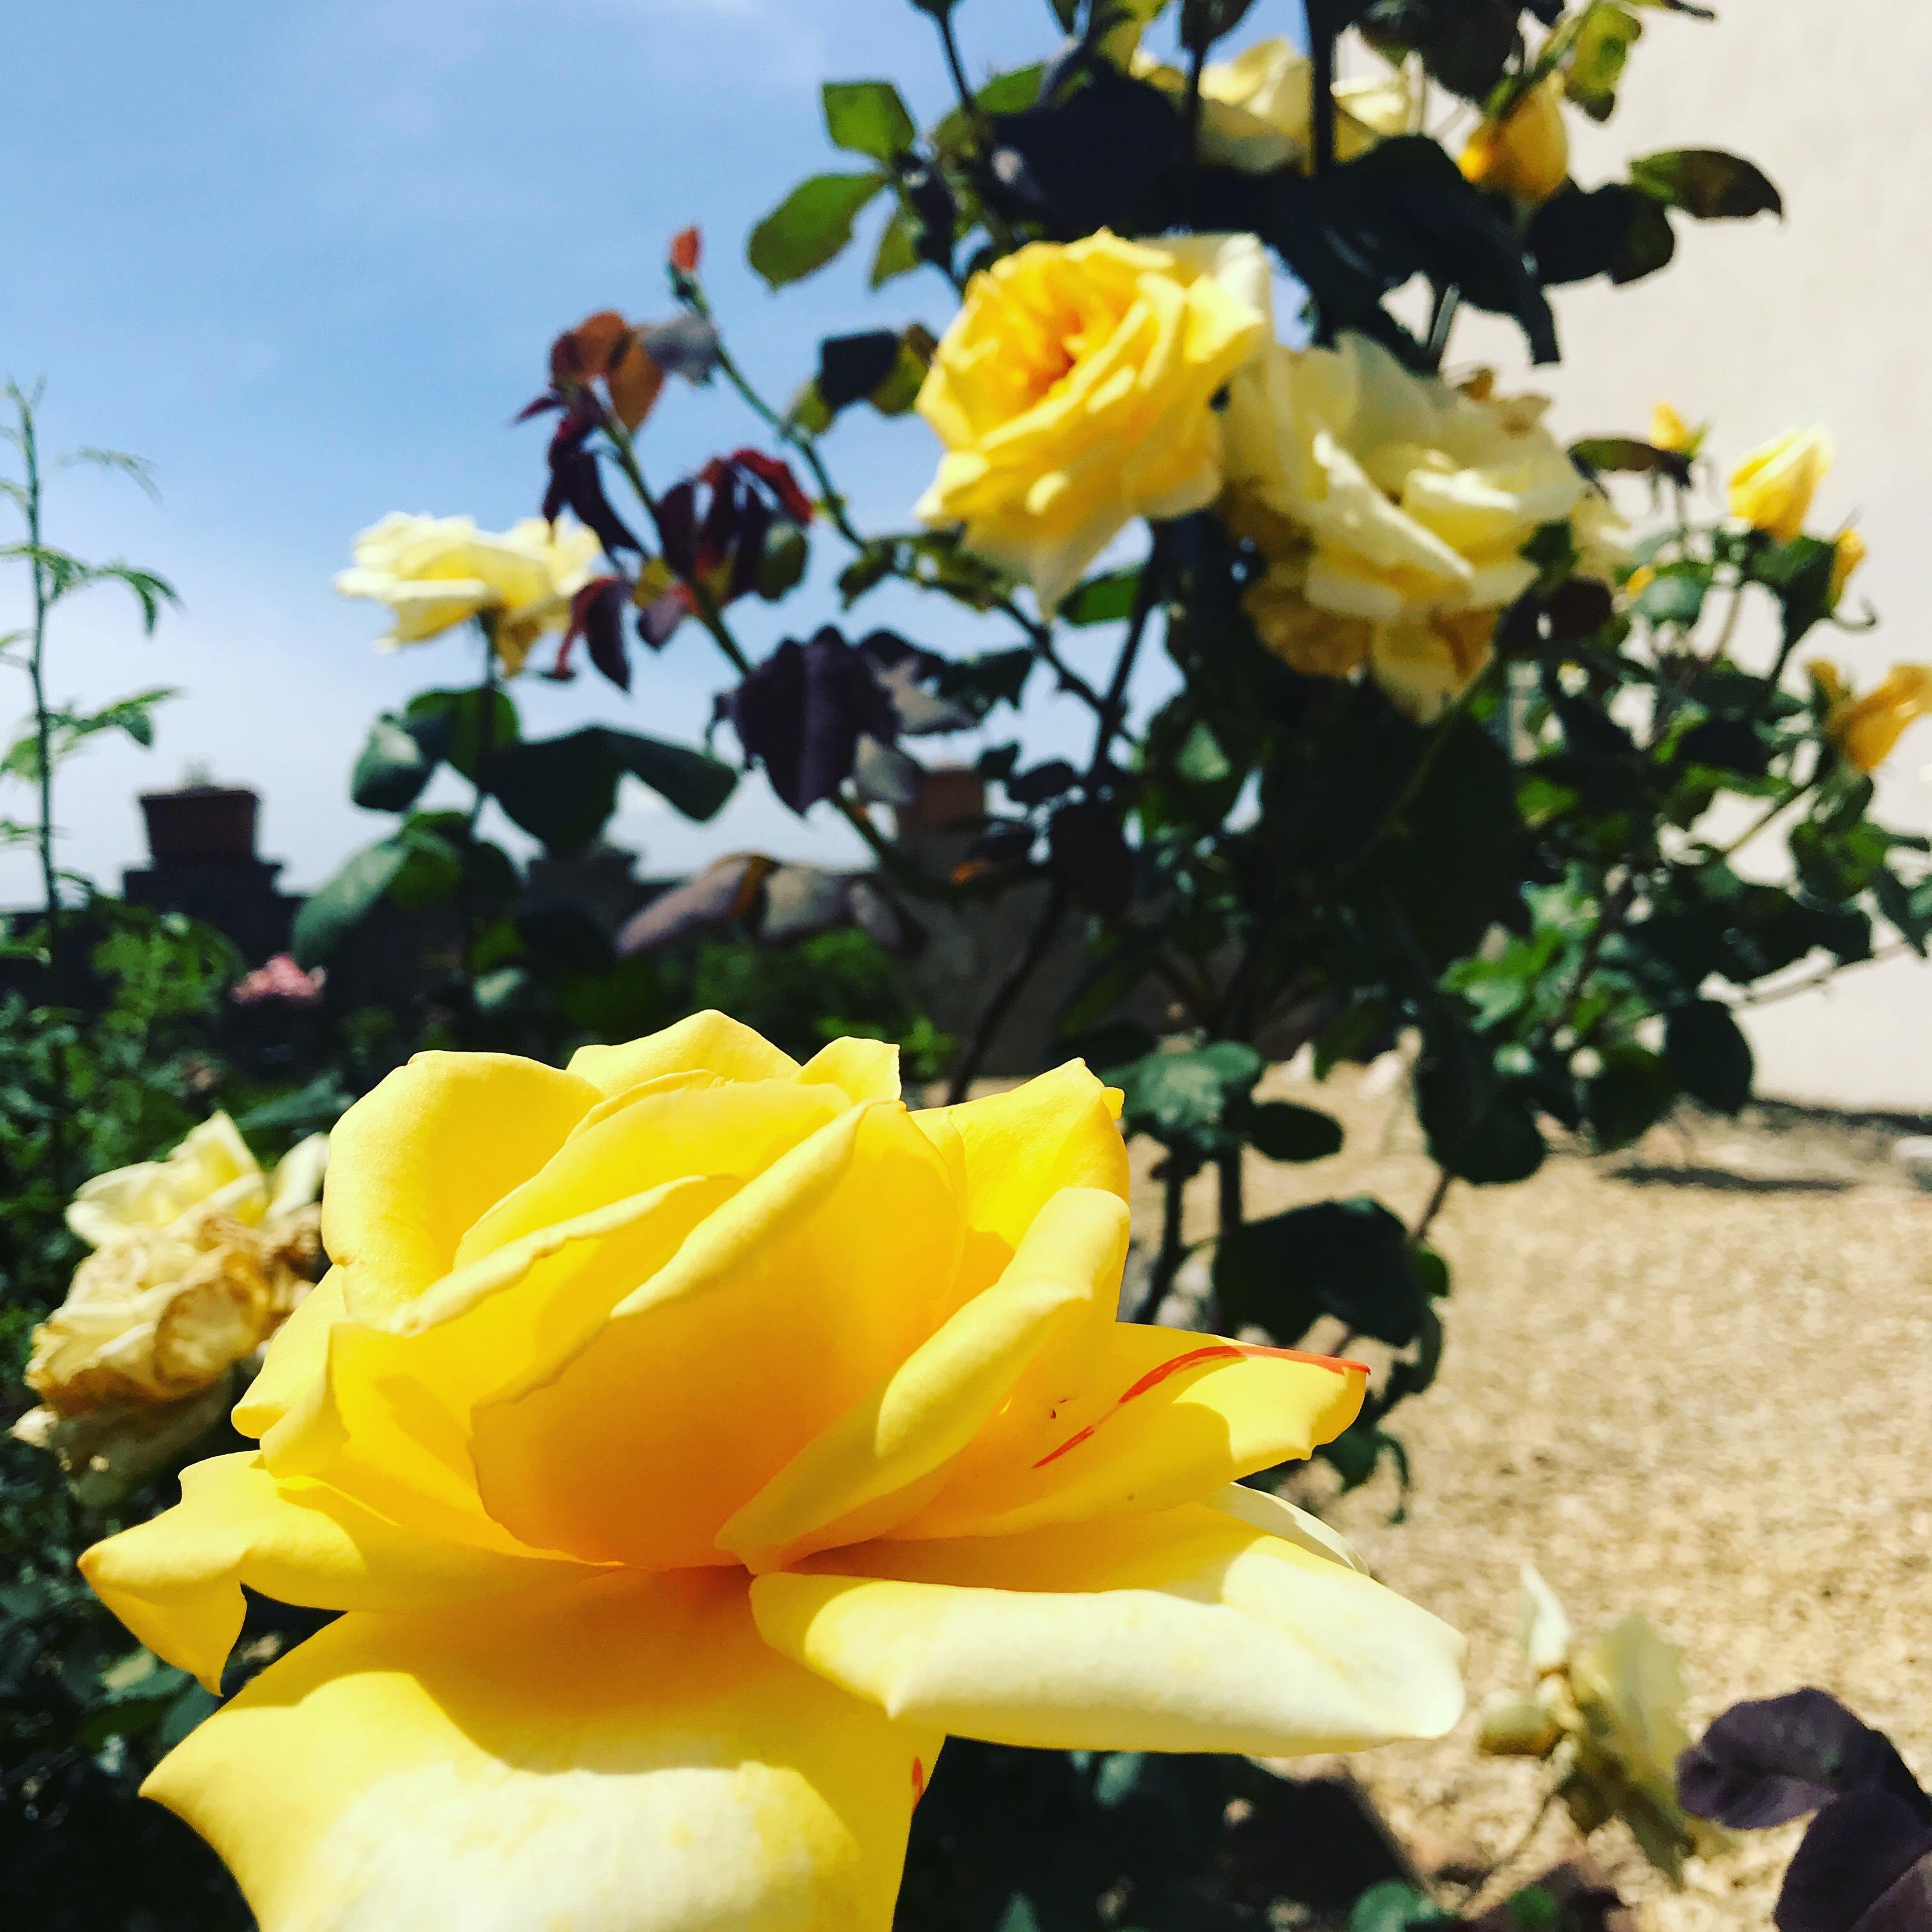 Domenica 10 ottobre, giardino d'autunno